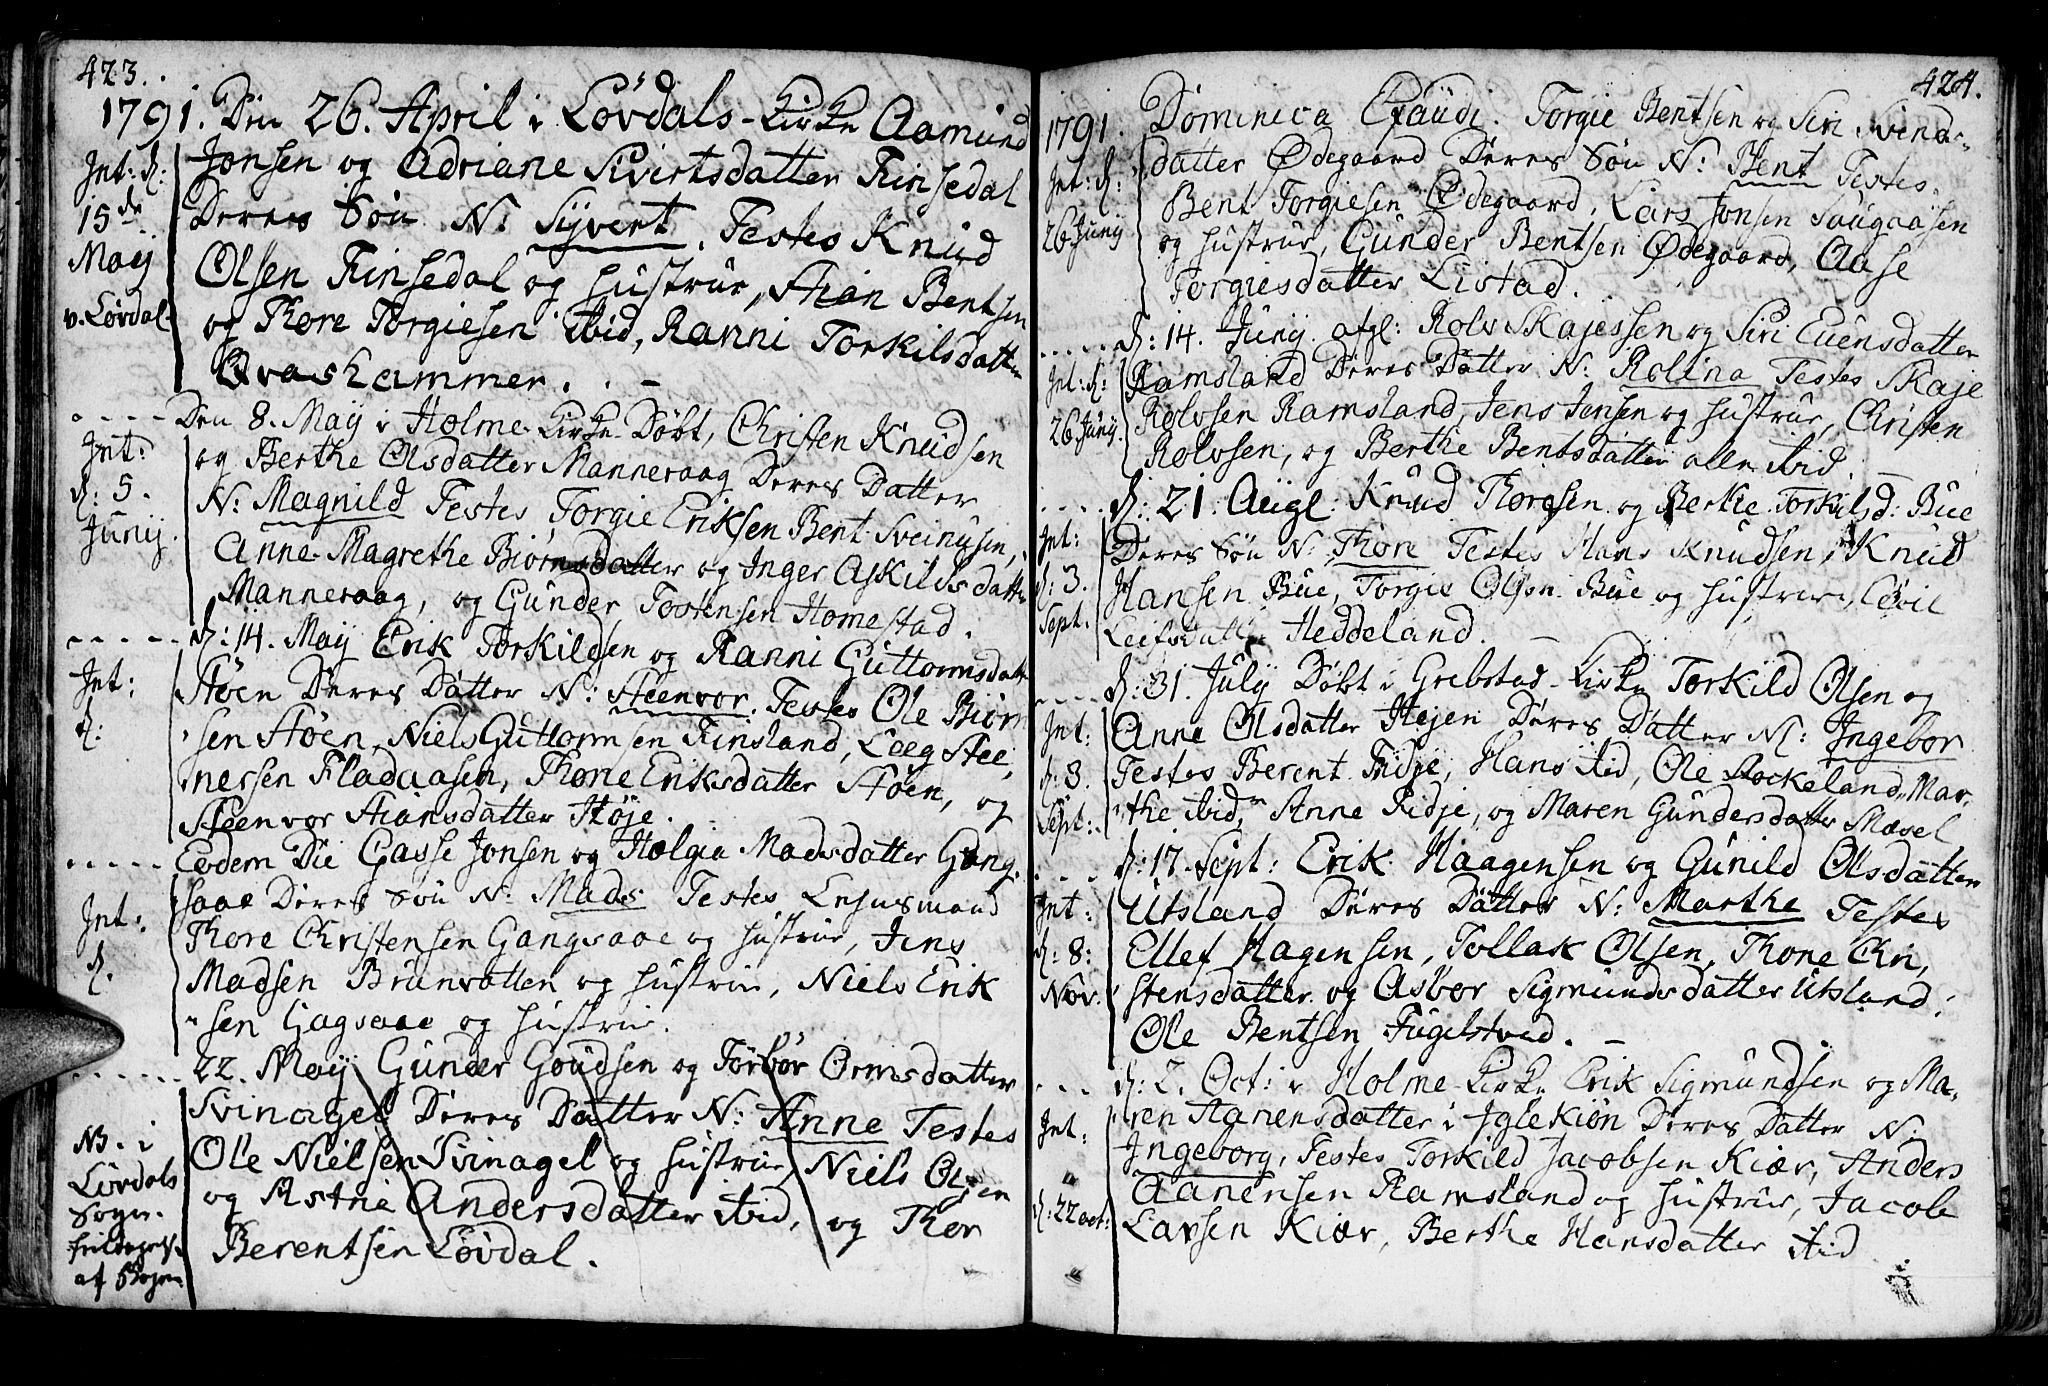 SAK, Holum sokneprestkontor, F/Fa/Fac/L0001: Ministerialbok nr. A 1, 1773-1820, s. 423-424